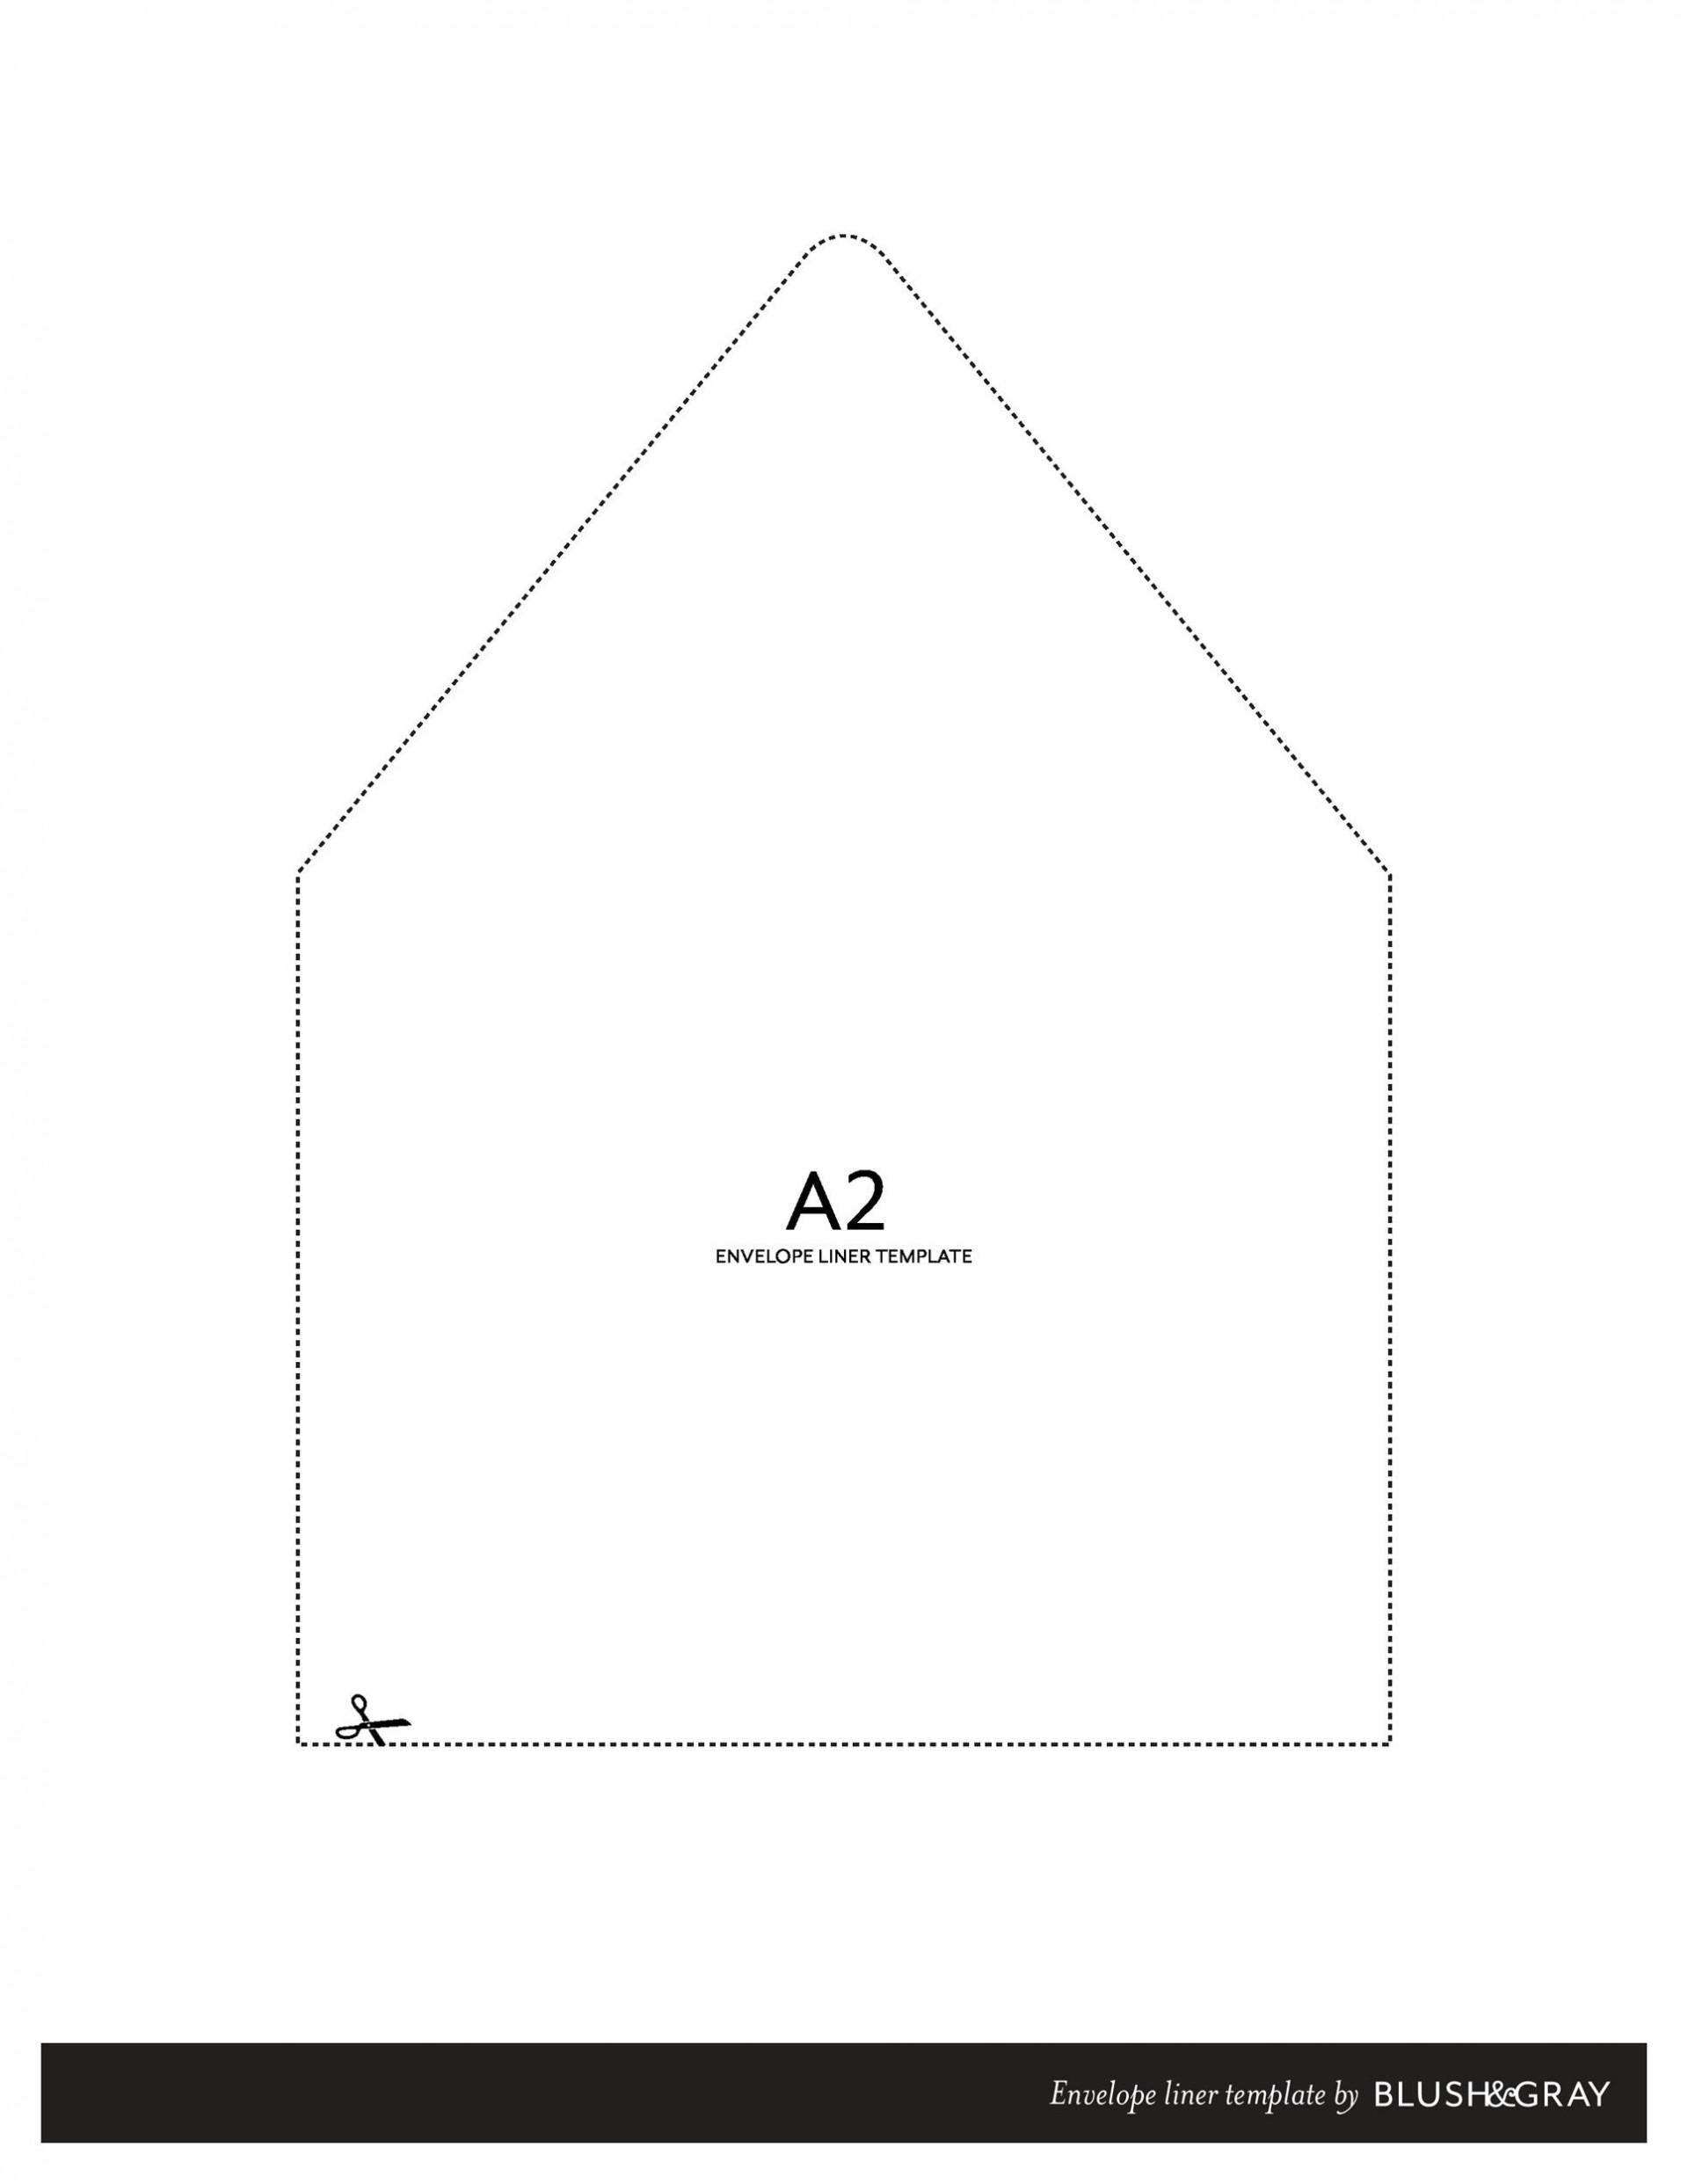 006 Awful 5x7 Envelope Template Word Sample  Microsoft Free1920